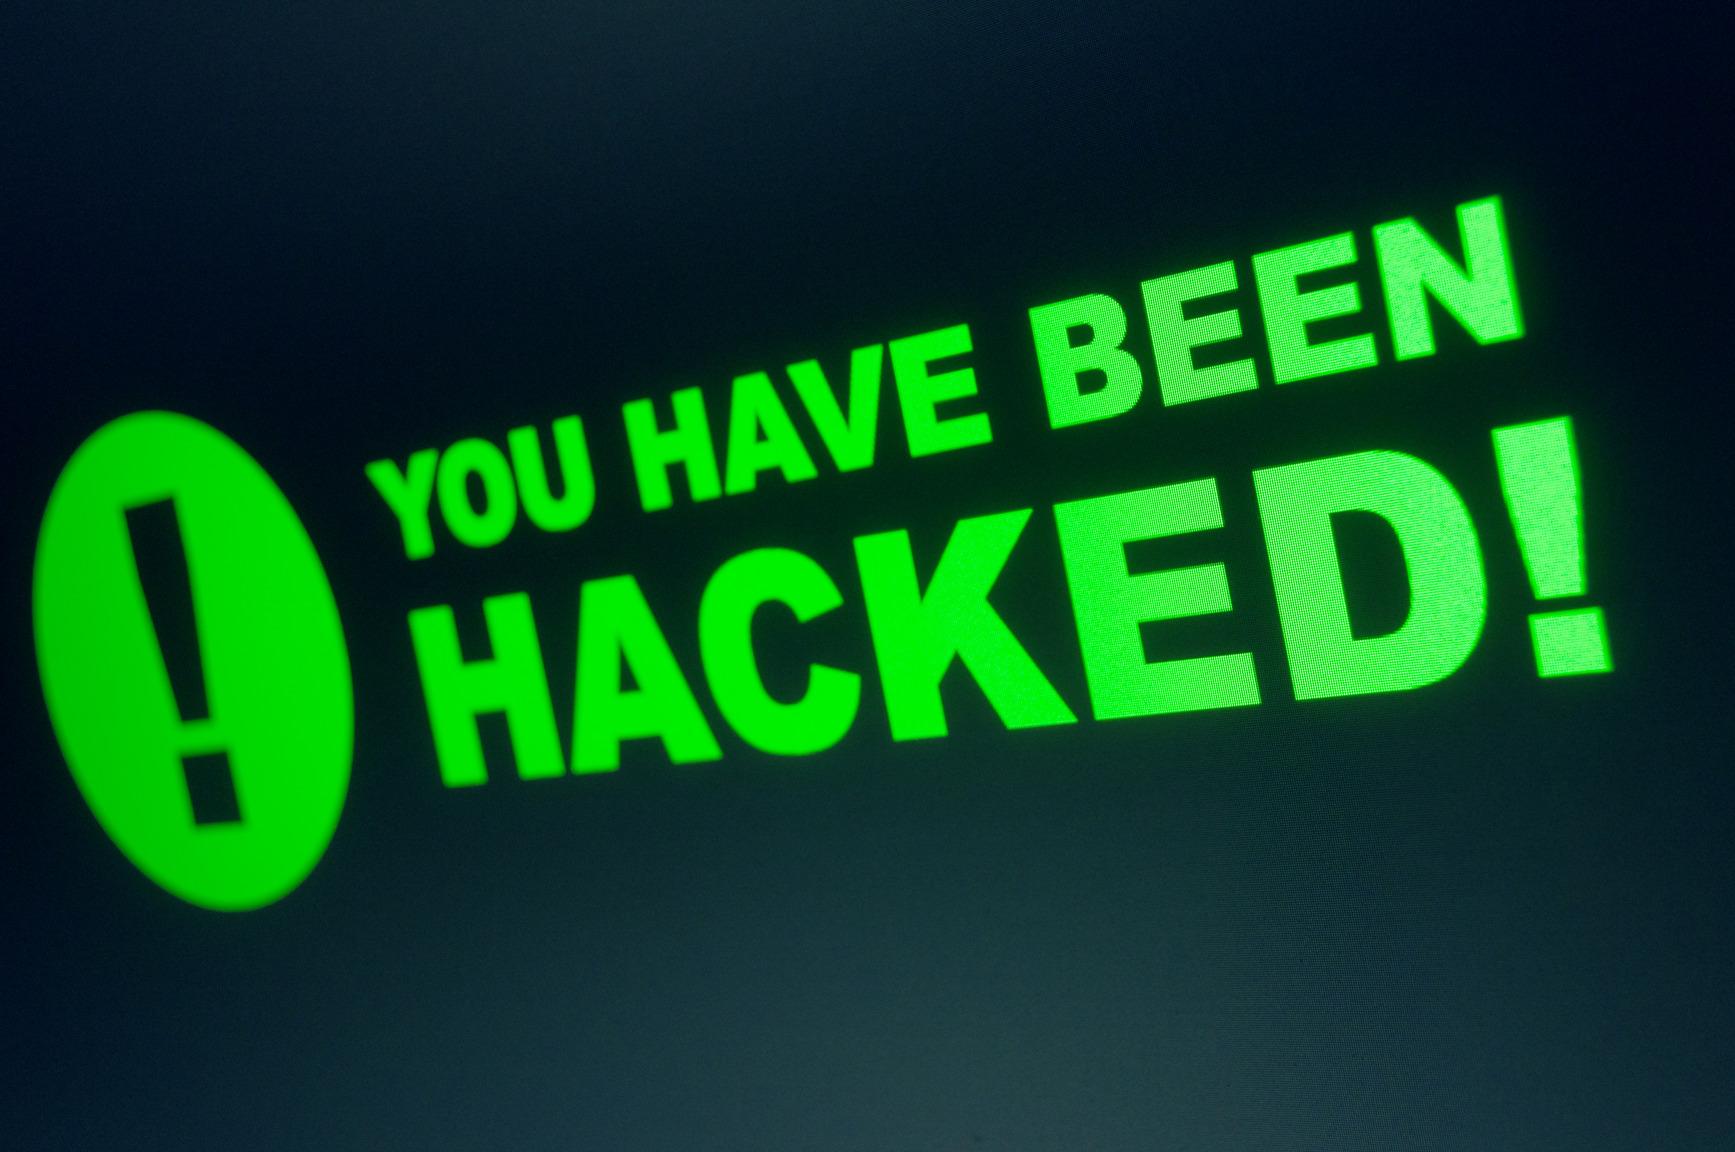 You Have Been Hacked Wallpaper - WallpaperSafari